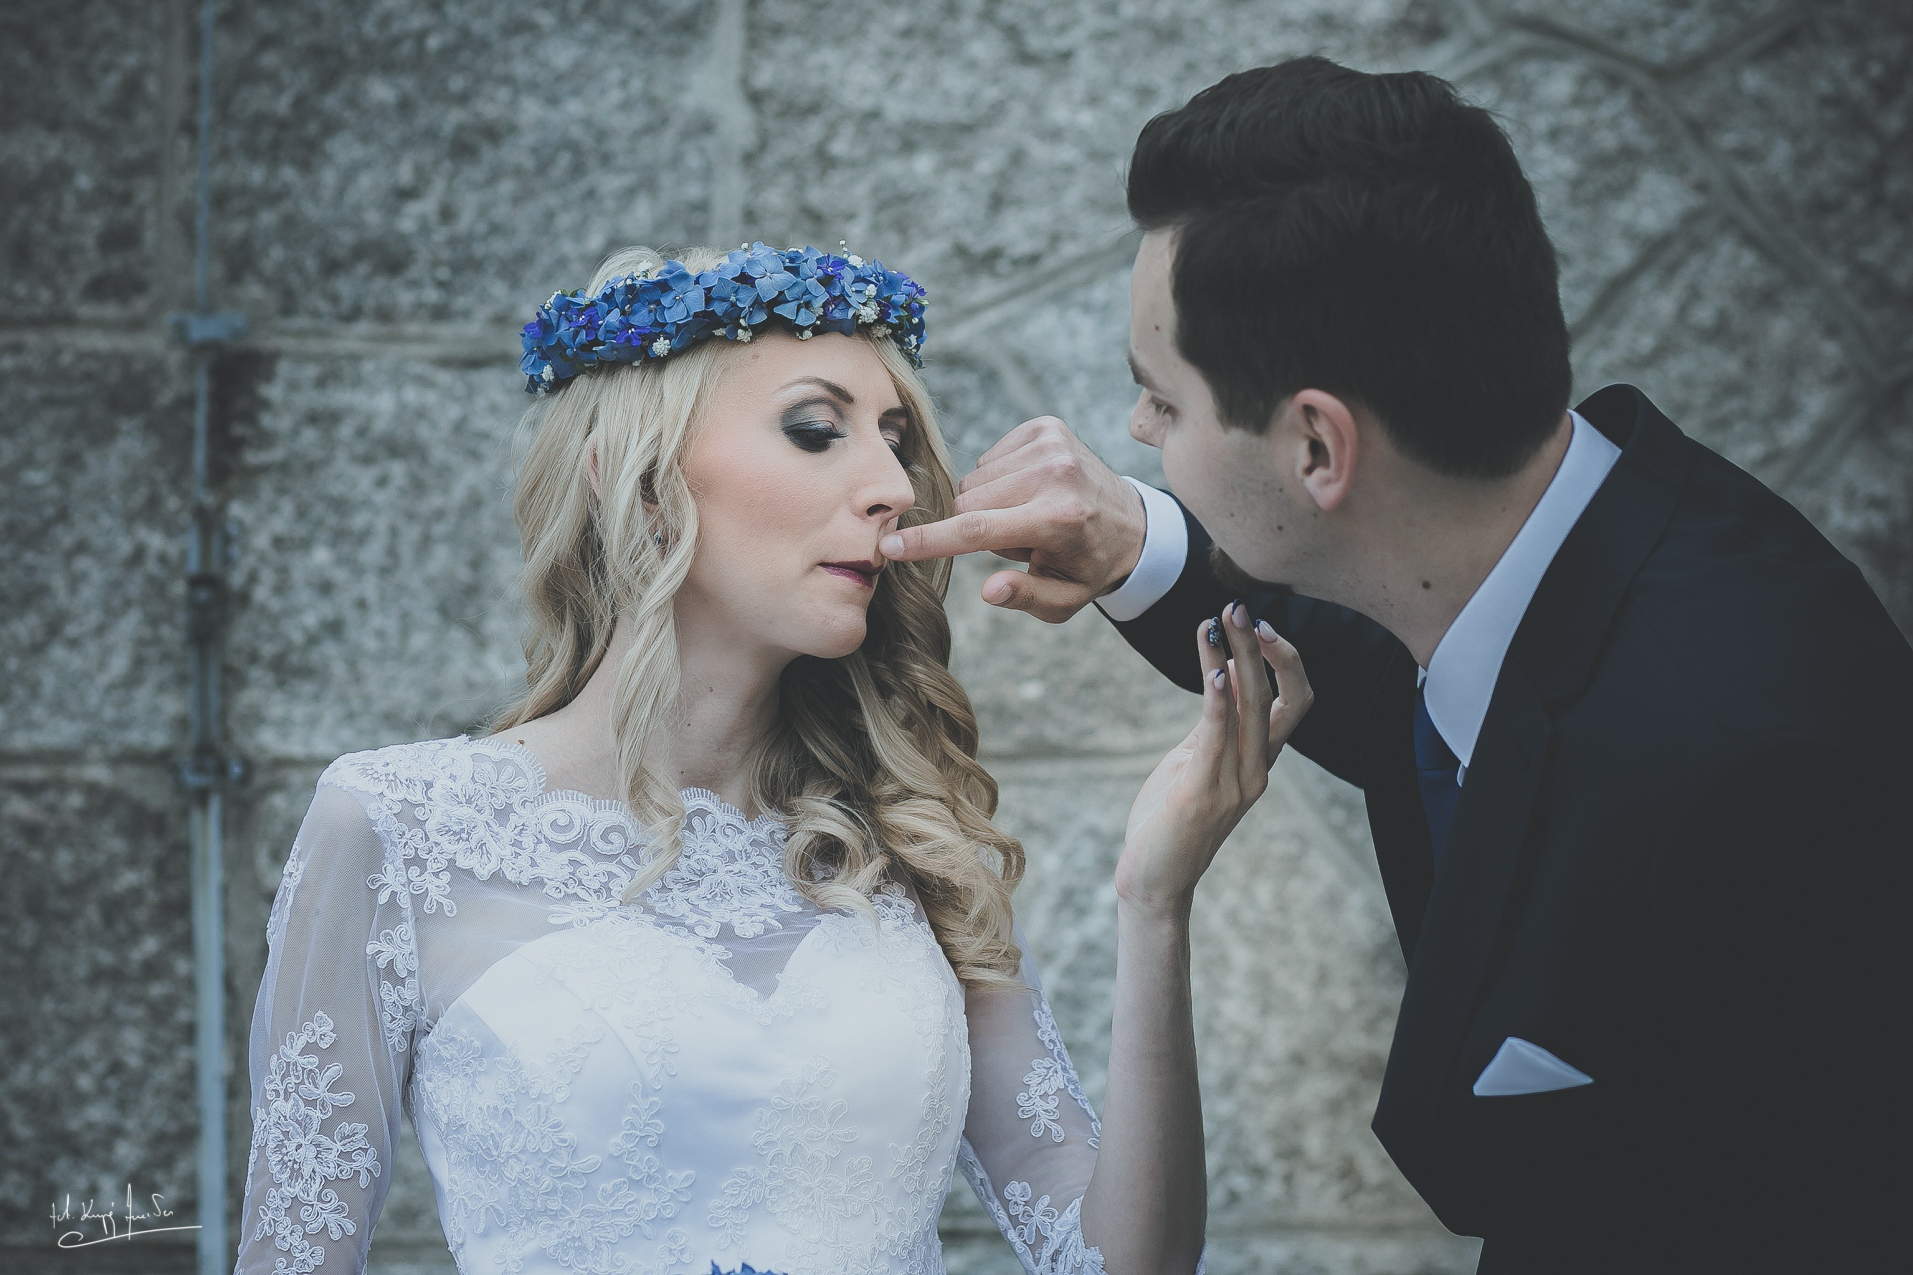 Ślub wesele szklarska poręba 16 Marta & Sławek